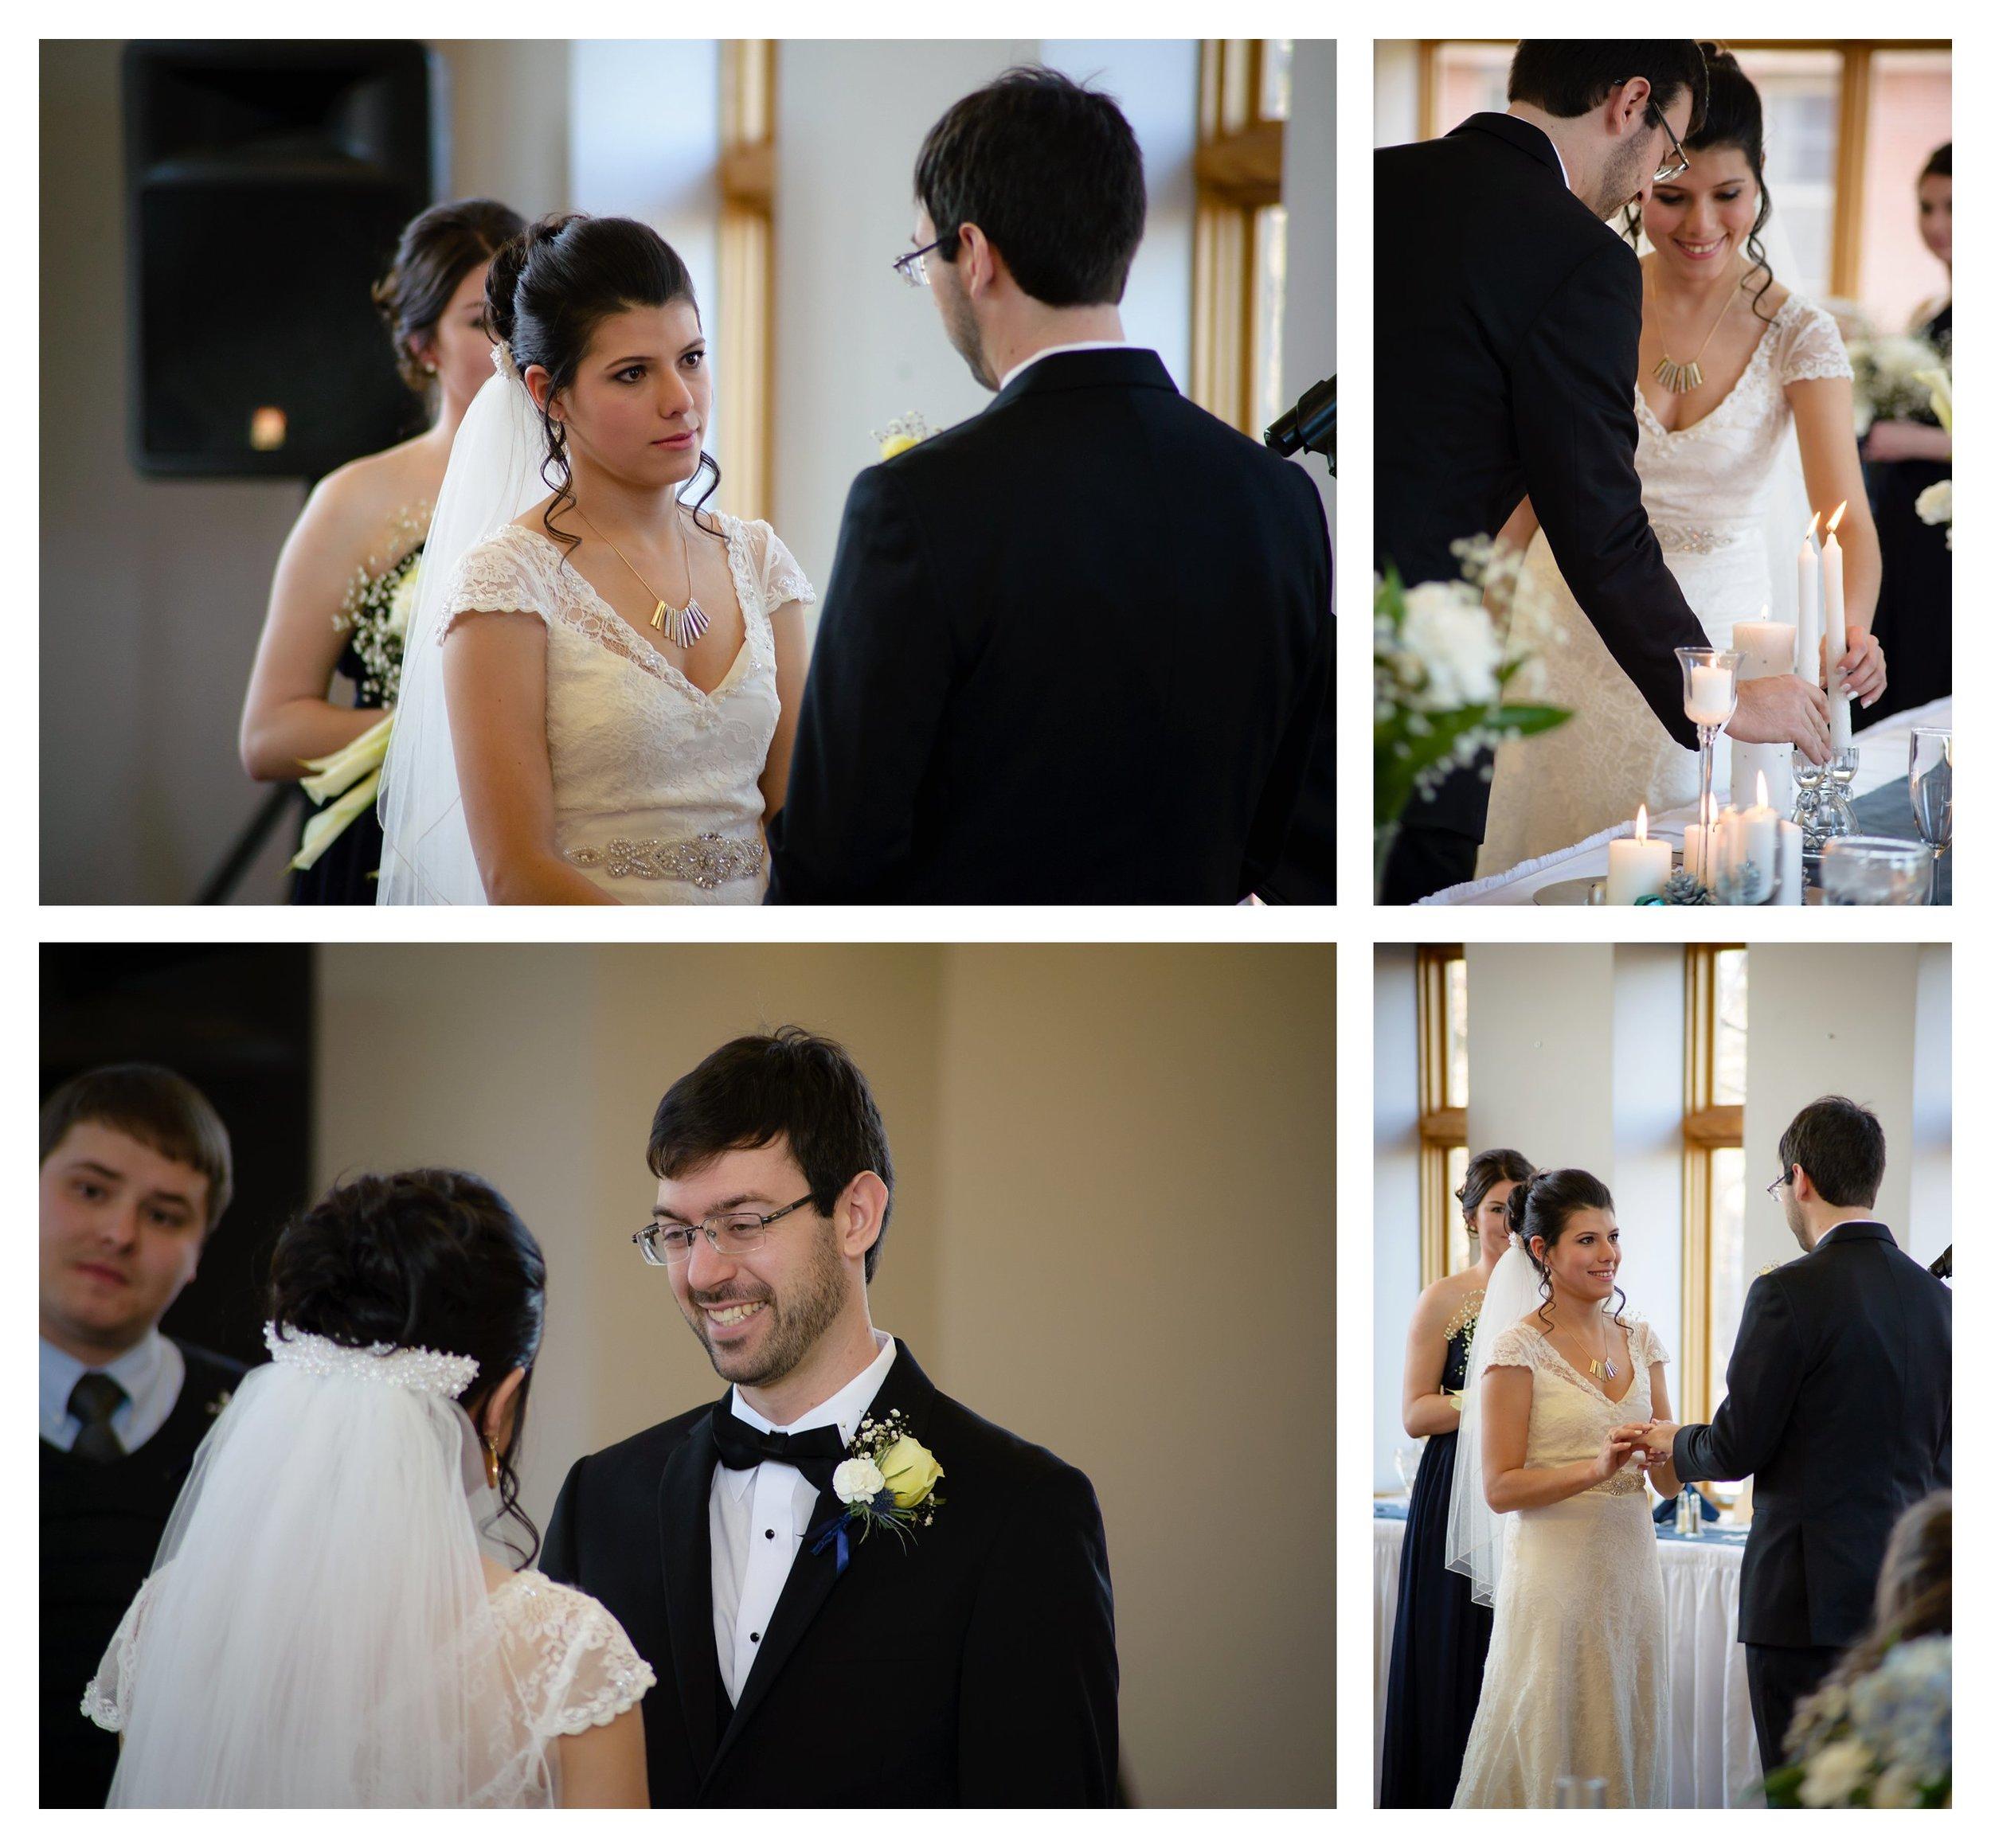 ashland wedding photographer iron river brule wisconsin ps 139 photography jen jensen_0141.jpg